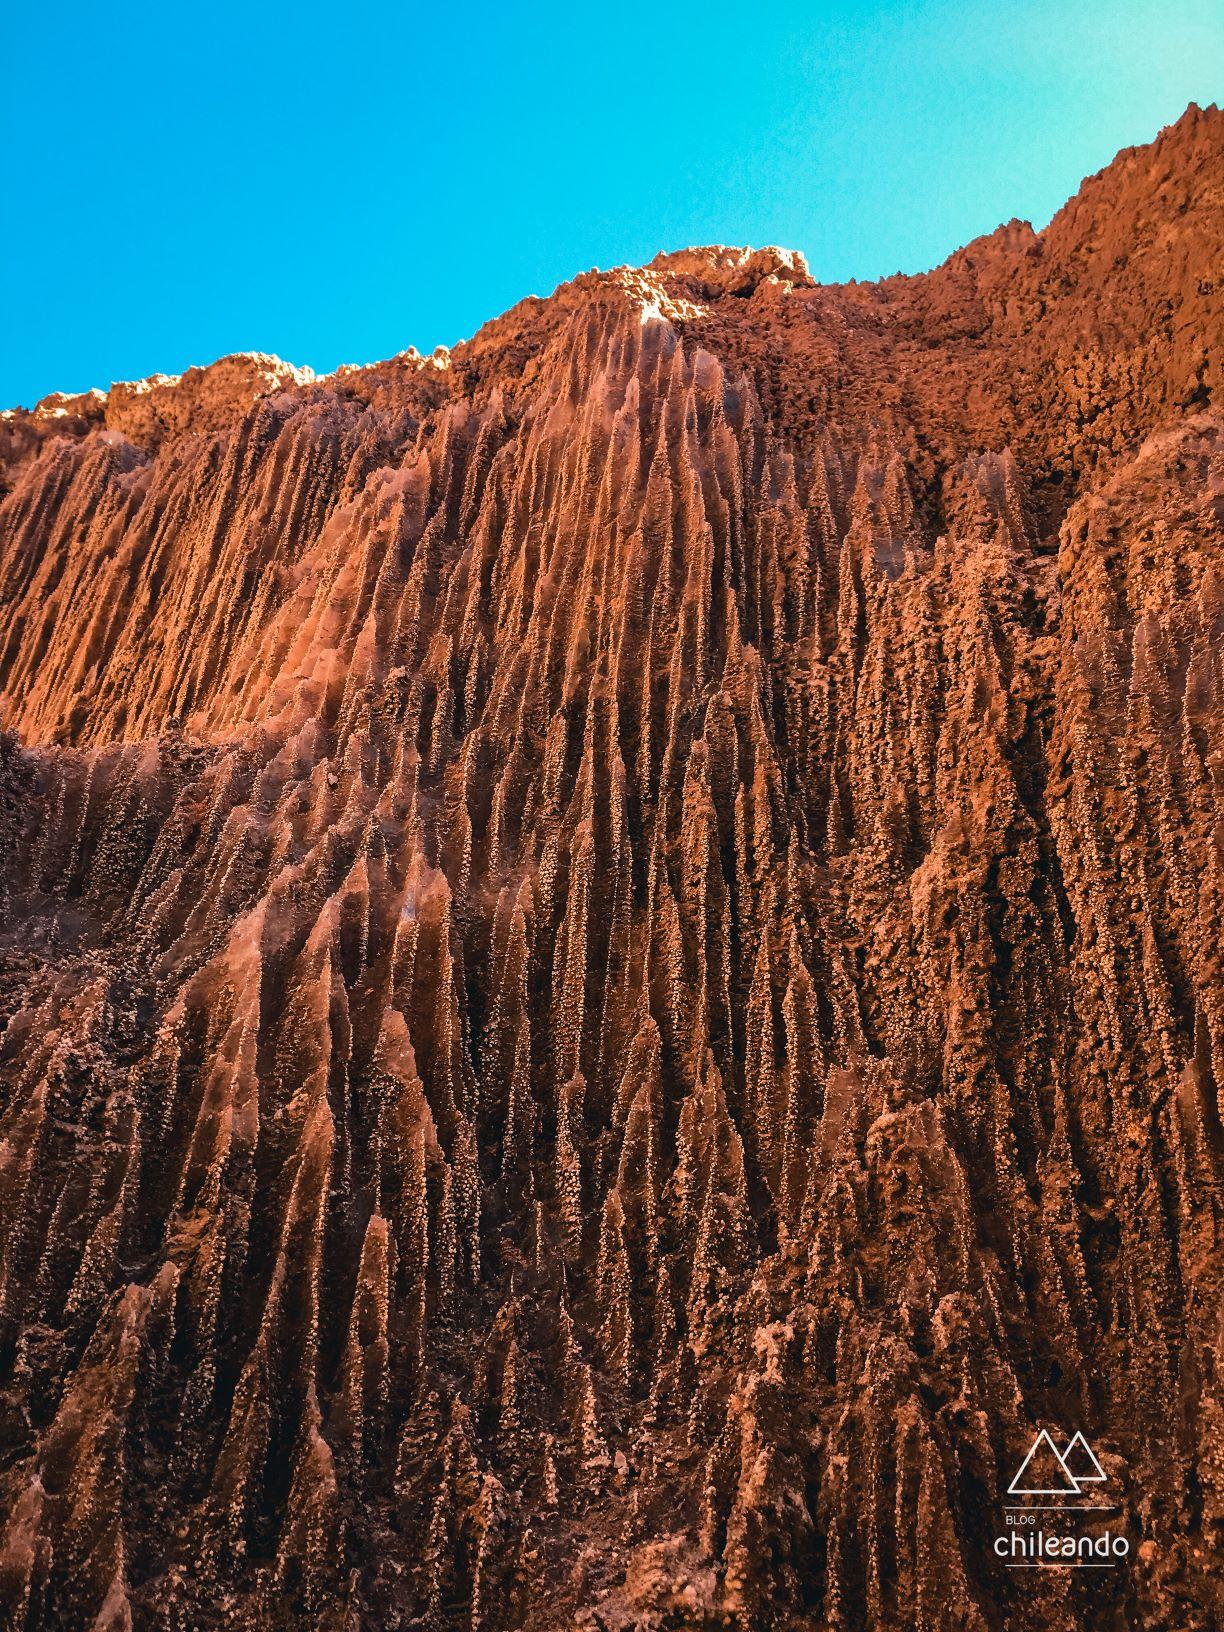 Formação rochosa do Valle de la Luna